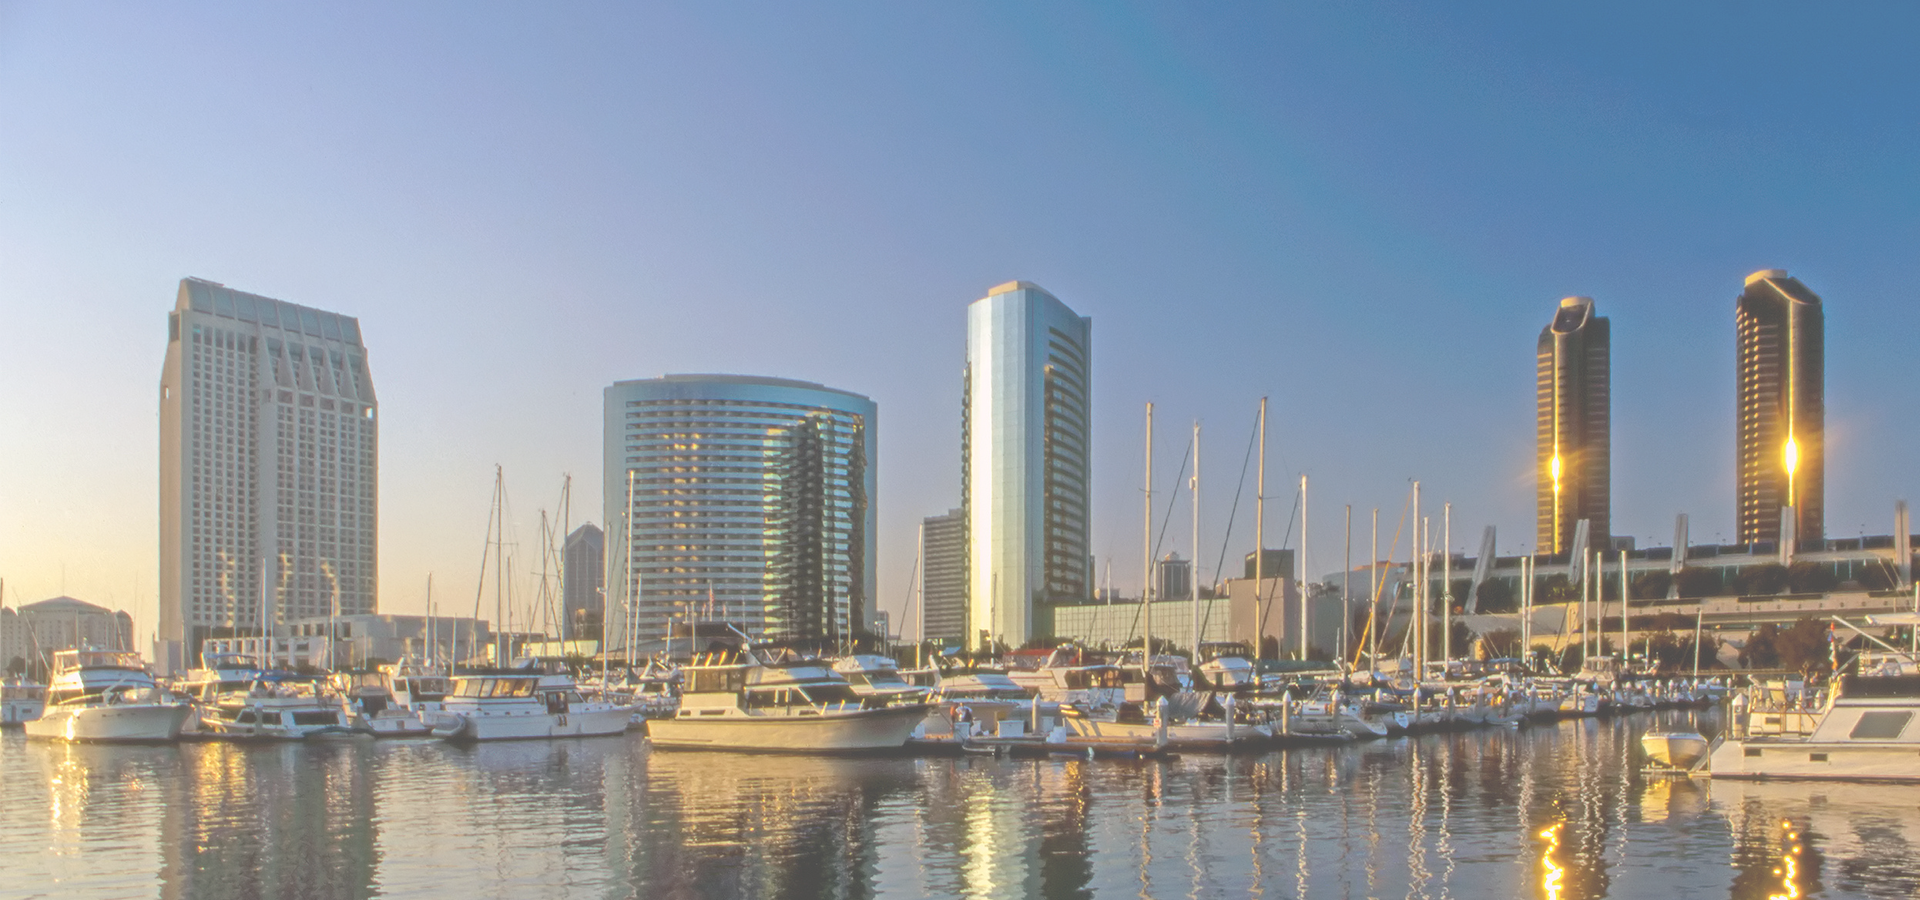 Peer-to-peer advisory in San Diego, California, USA